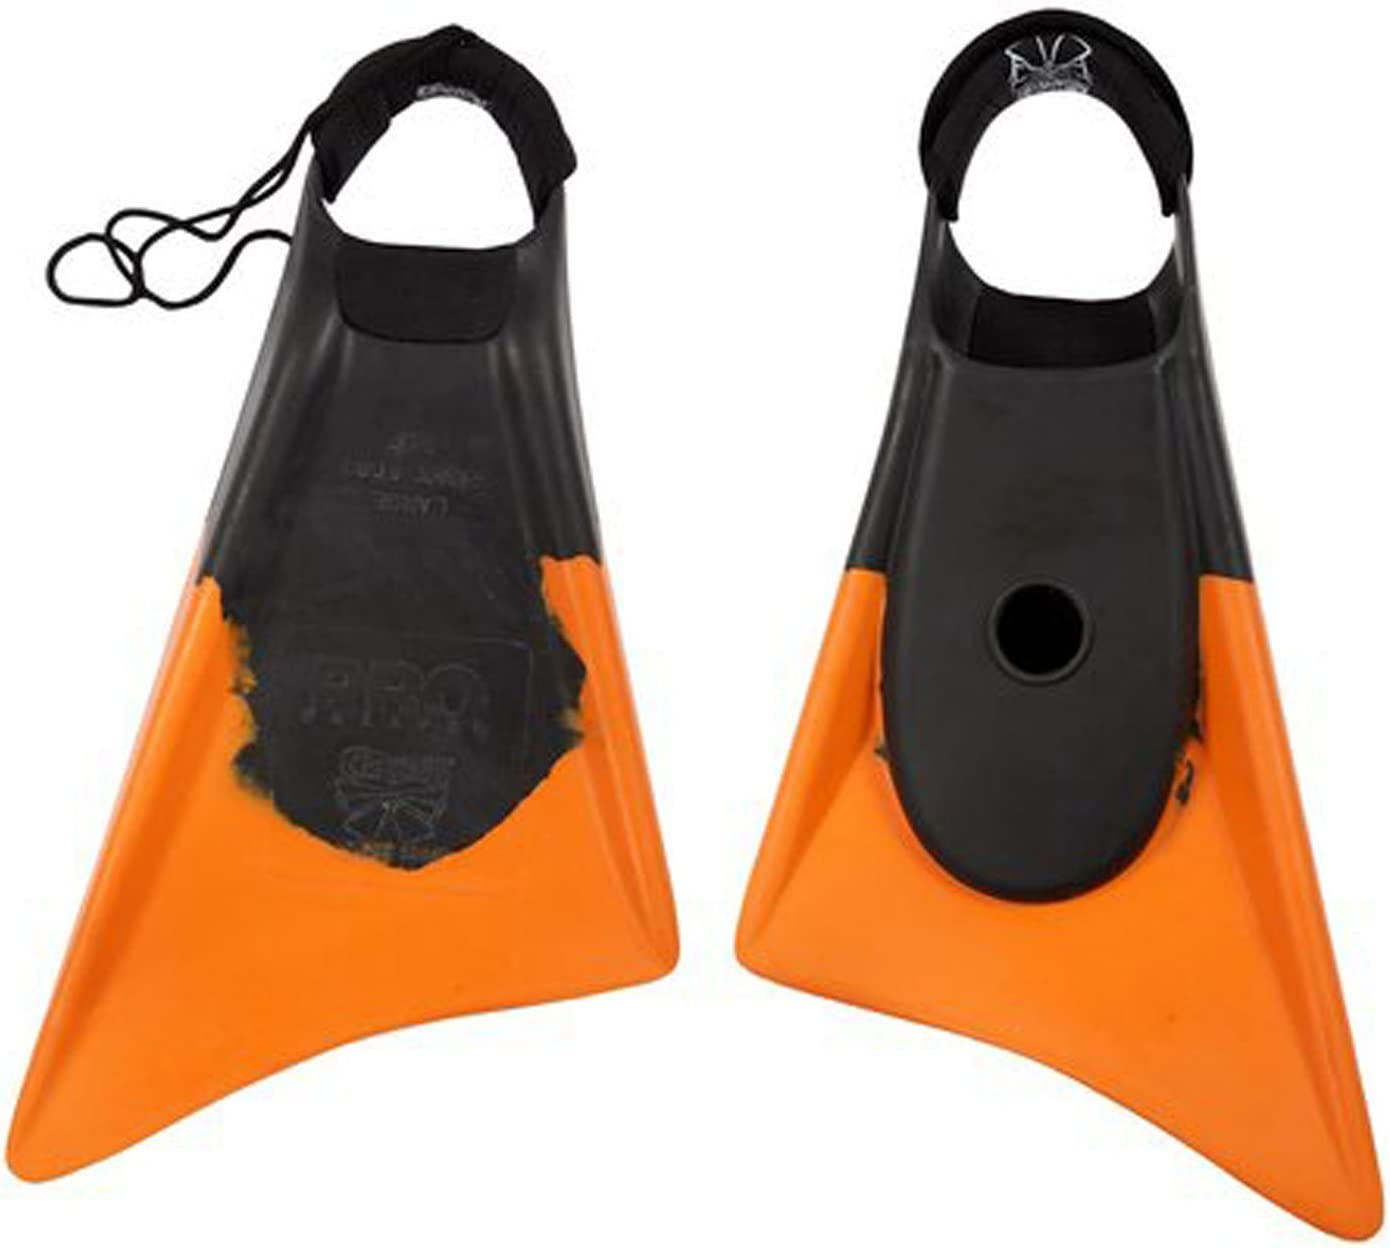 Churchill Makapuu PRO Swimfins Asymmetrical Dolphin Swim Fin Bundled with a Heel Pad and Fin Insert Cushion